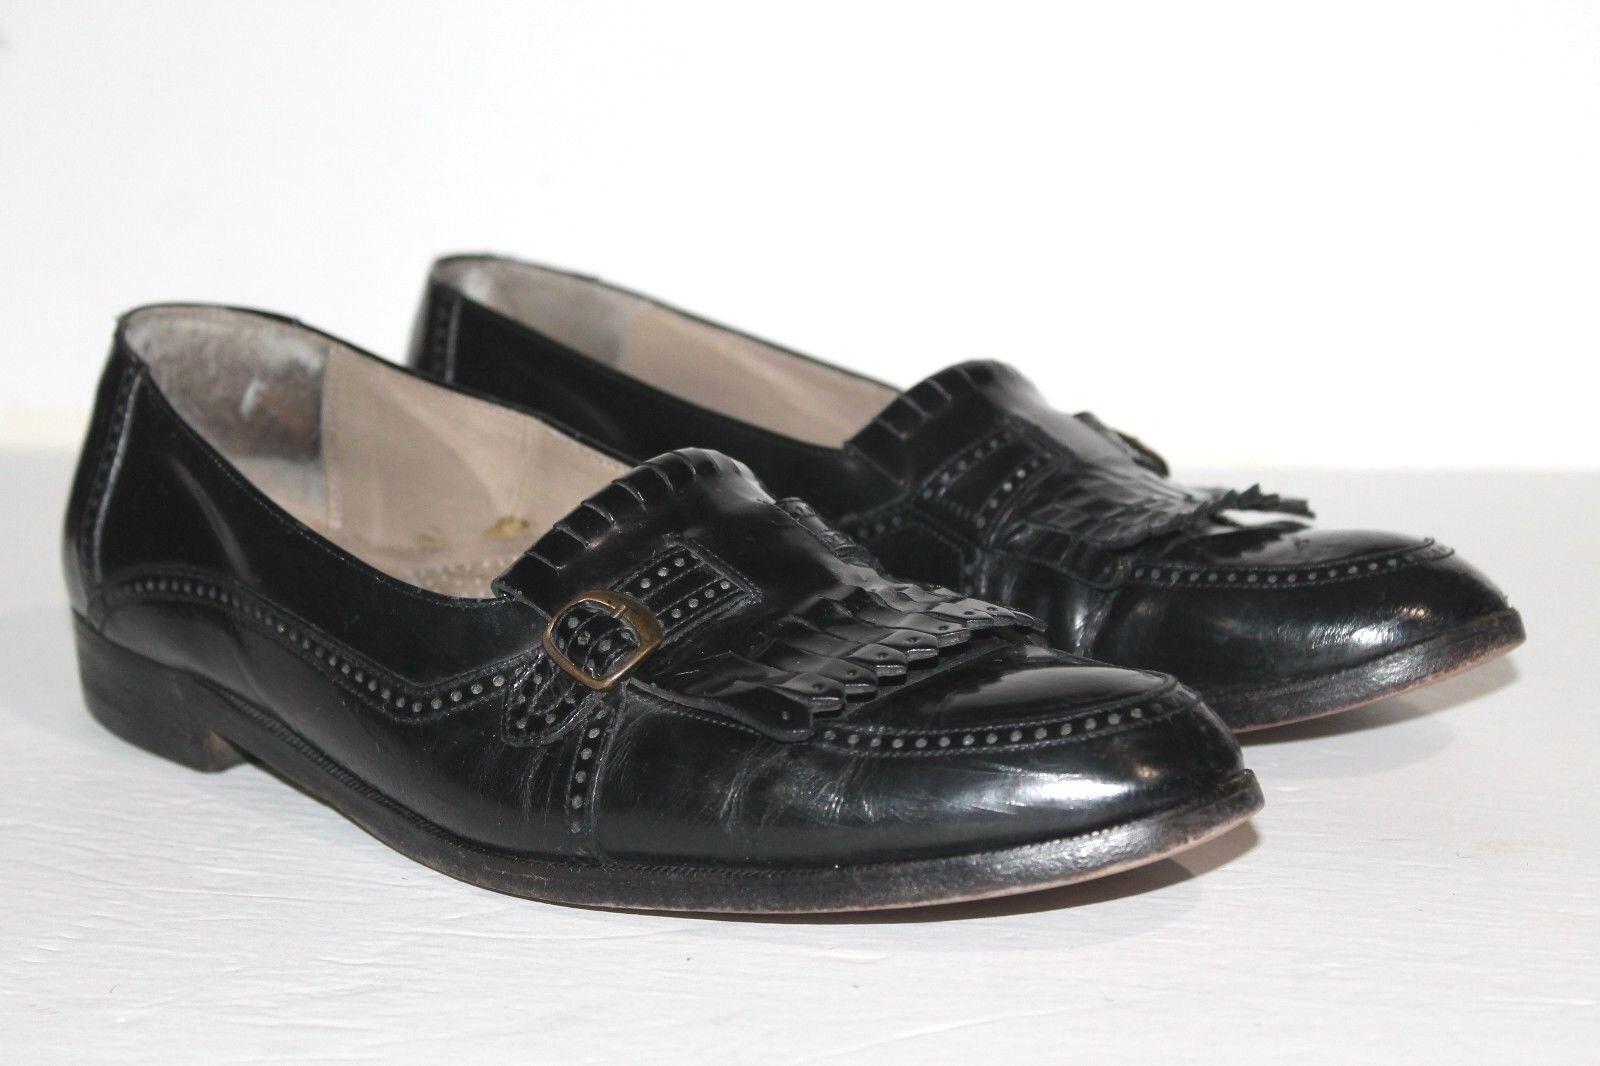 Men's BALLY Kiltie Monk Strap Brogue Black Loafer Patent shoes  US 10.5